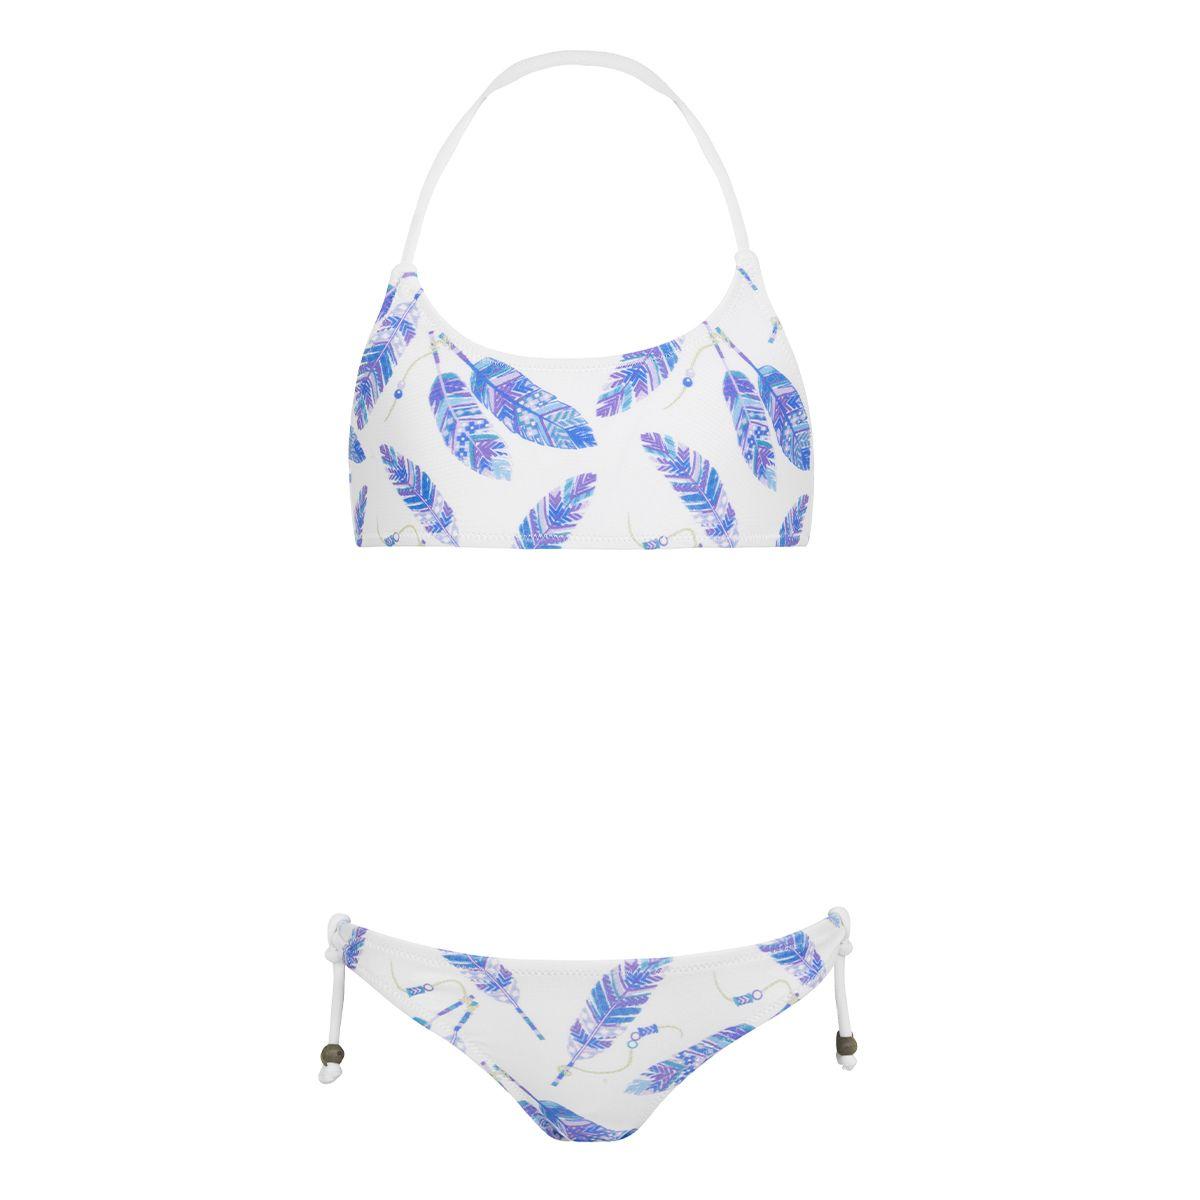 Sunuva Girls white feathers halter bikini